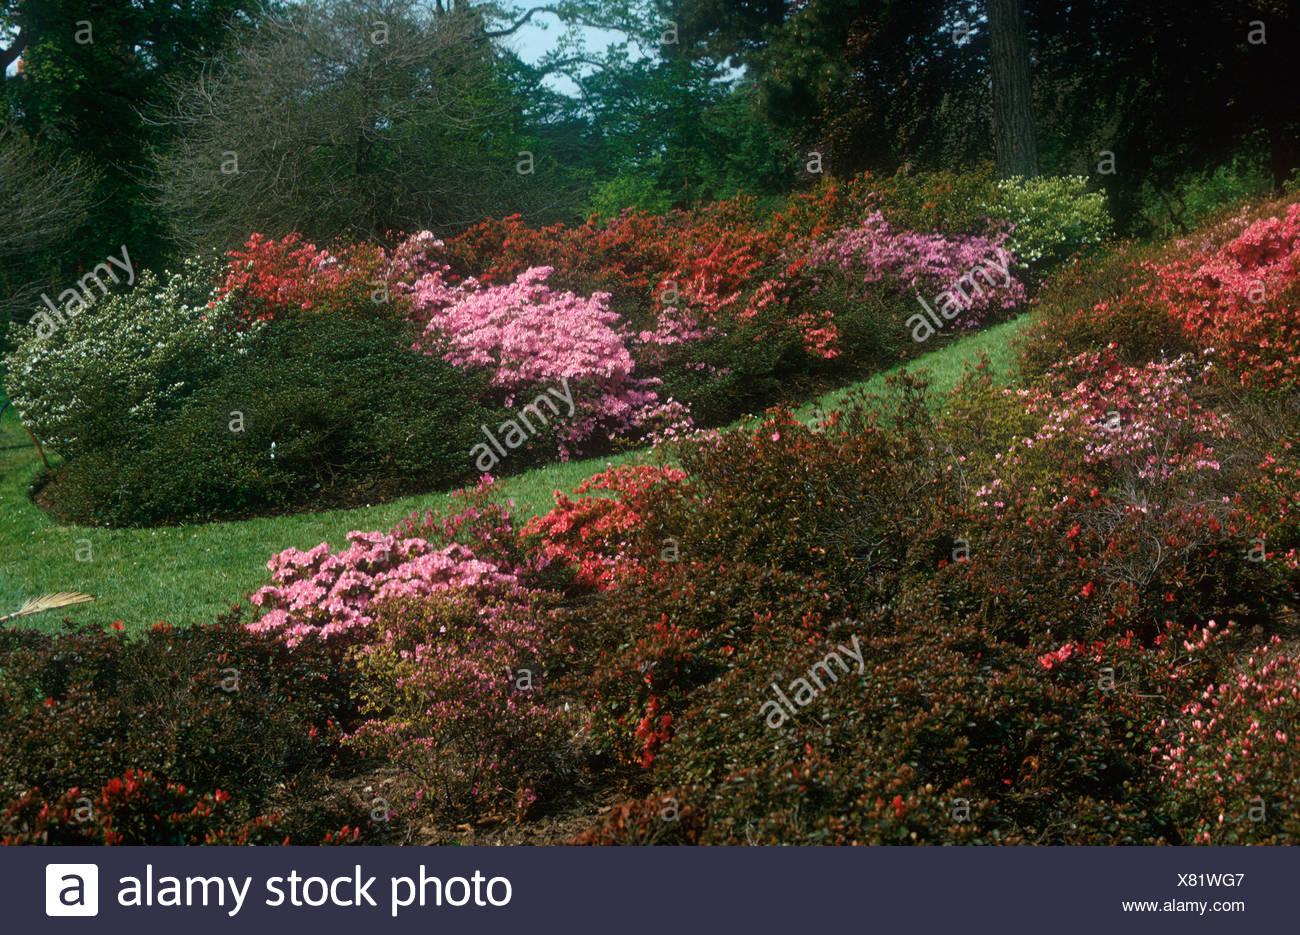 Garden Azalea in flower Kew Gardens Stock Photo: 280325143 - Alamy